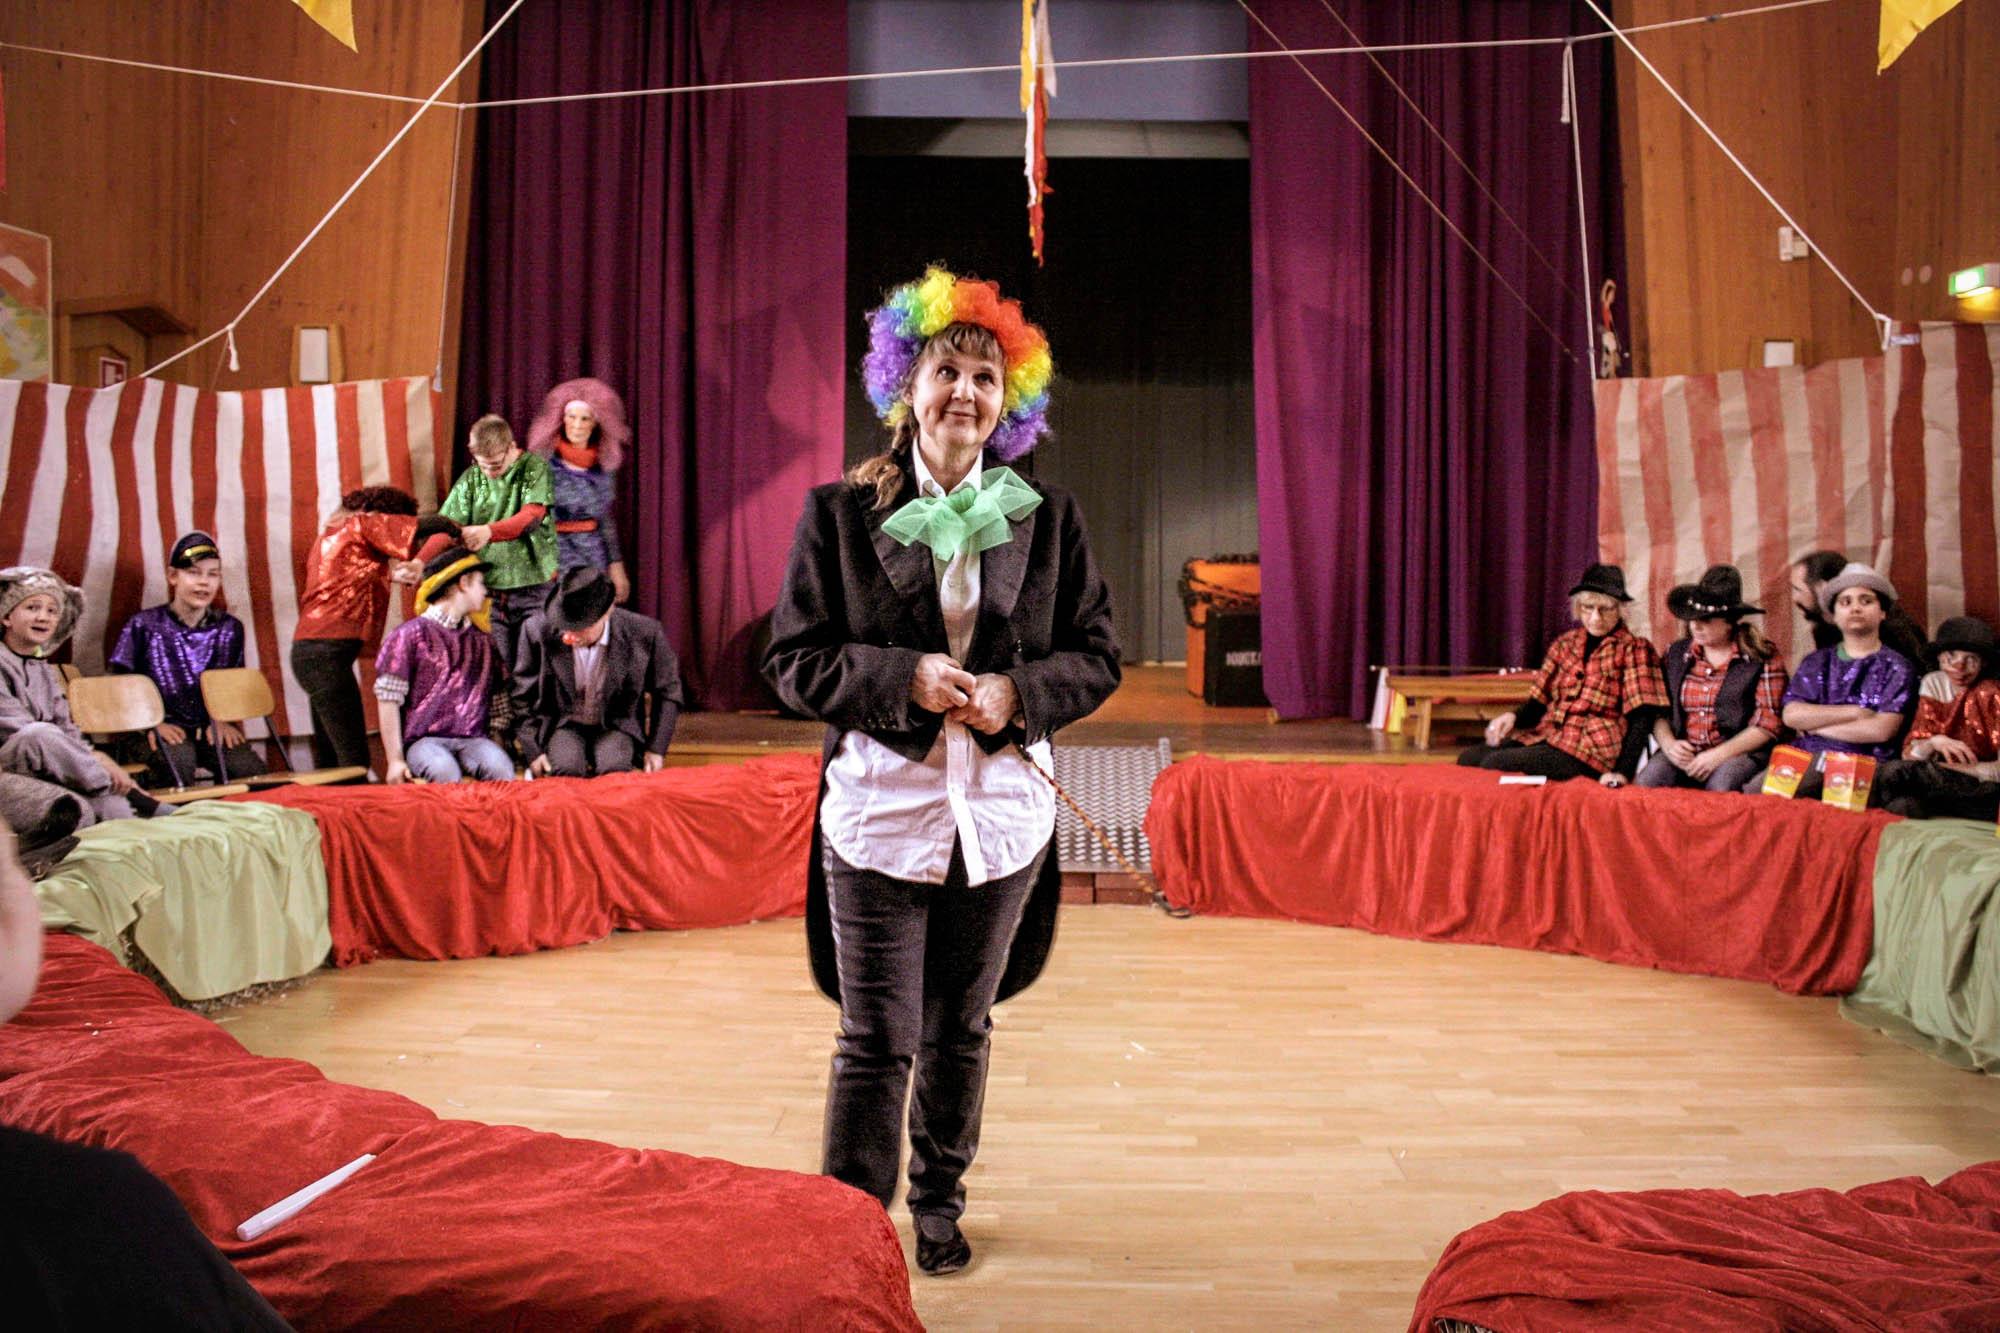 Cirkus_29.jpg